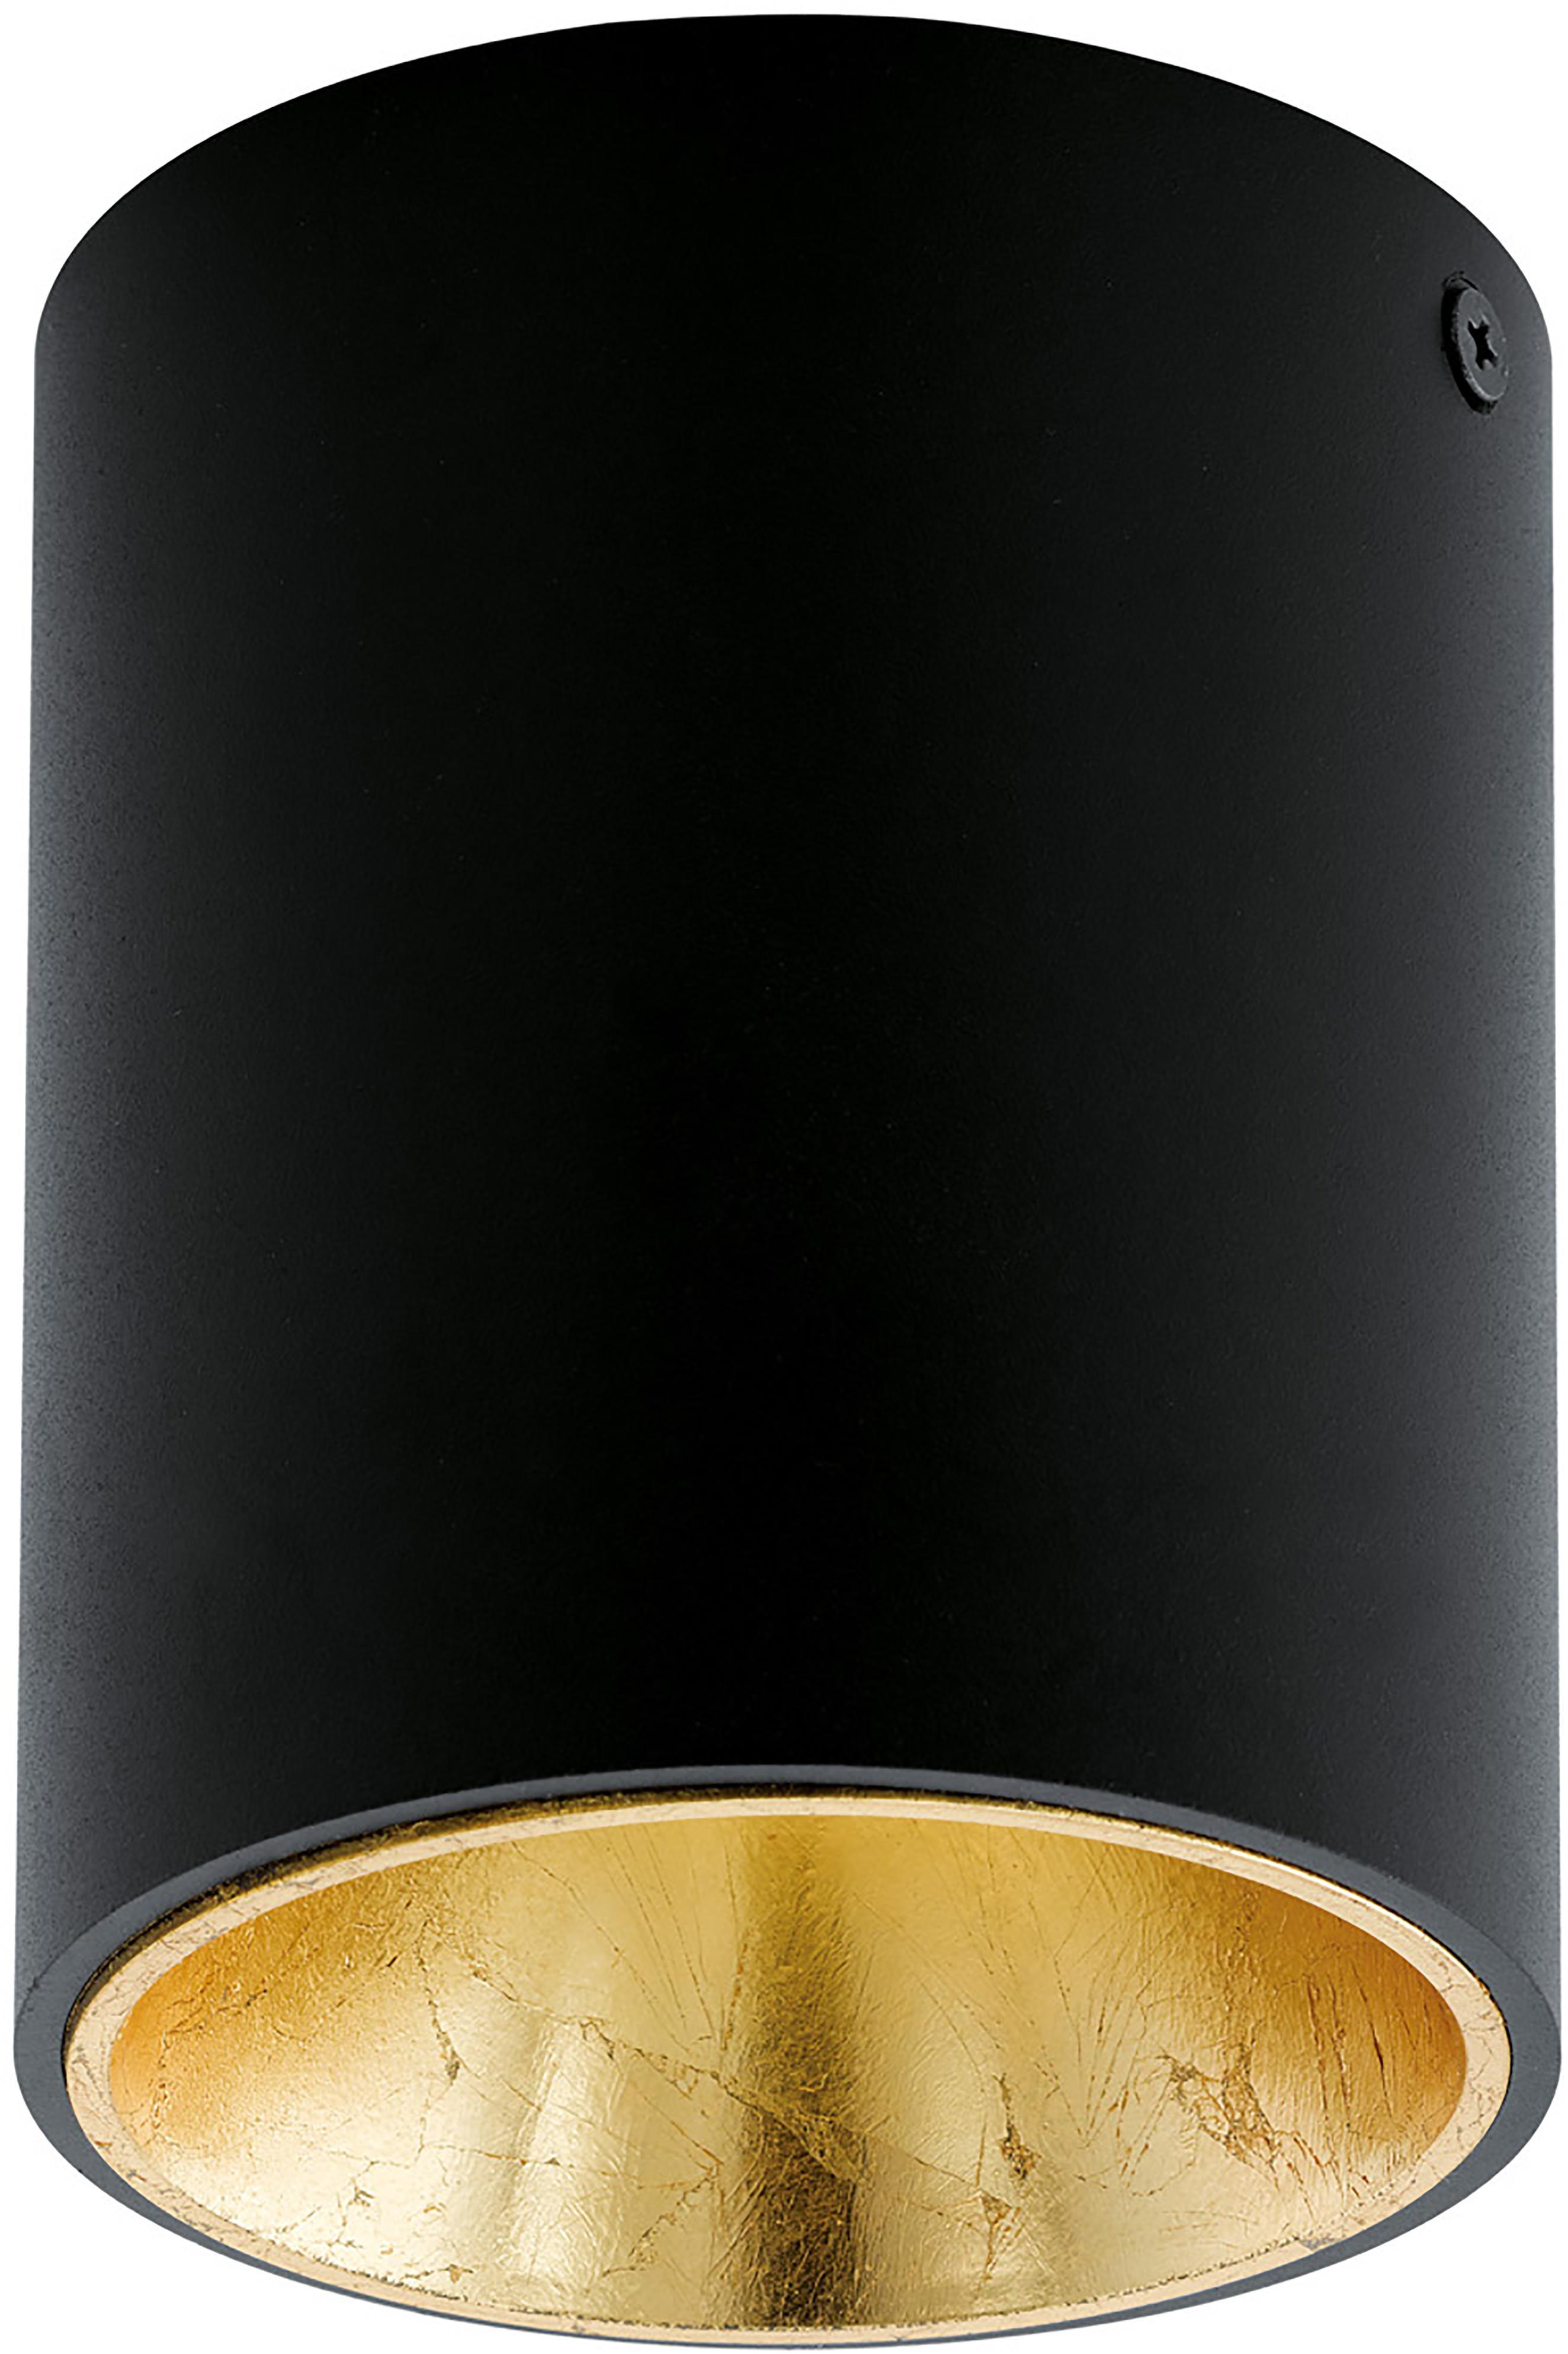 LED Deckenspot Marty, Schwarz,Goldfarben, ∅ 10 x H 12 cm